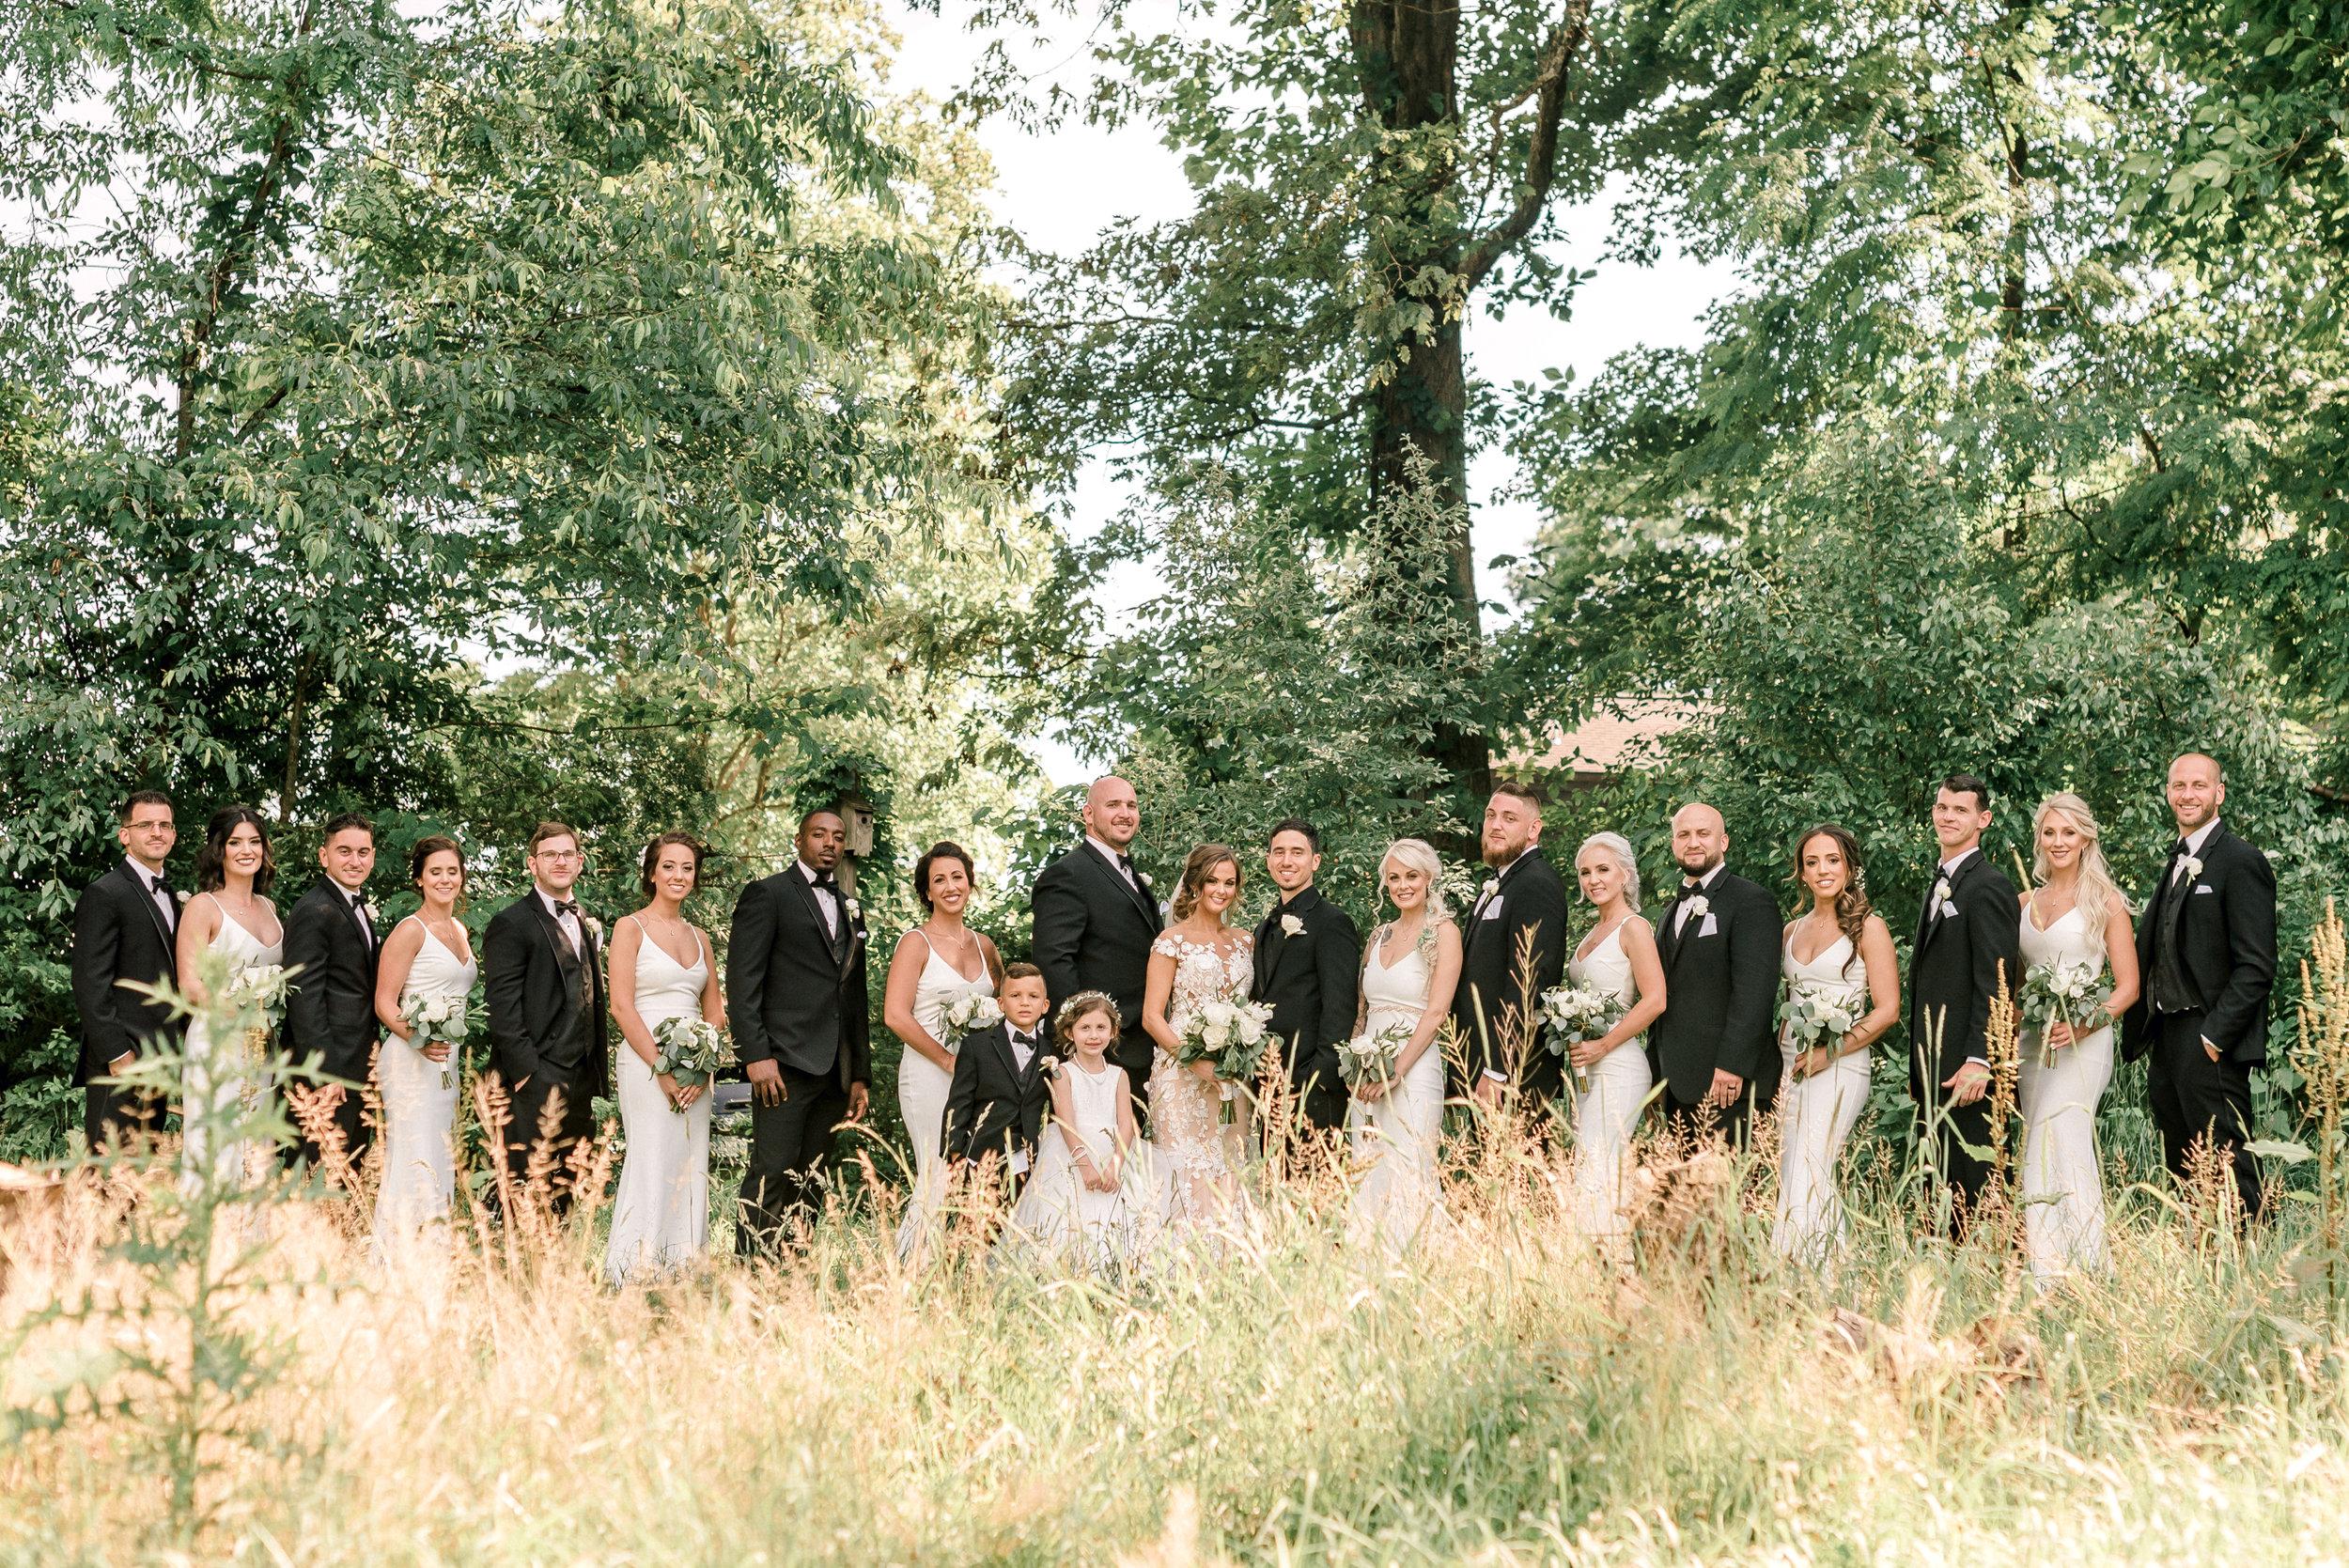 pittsburgh-wedding-photographer-grand-estate-hidden-acres-0034.jpg